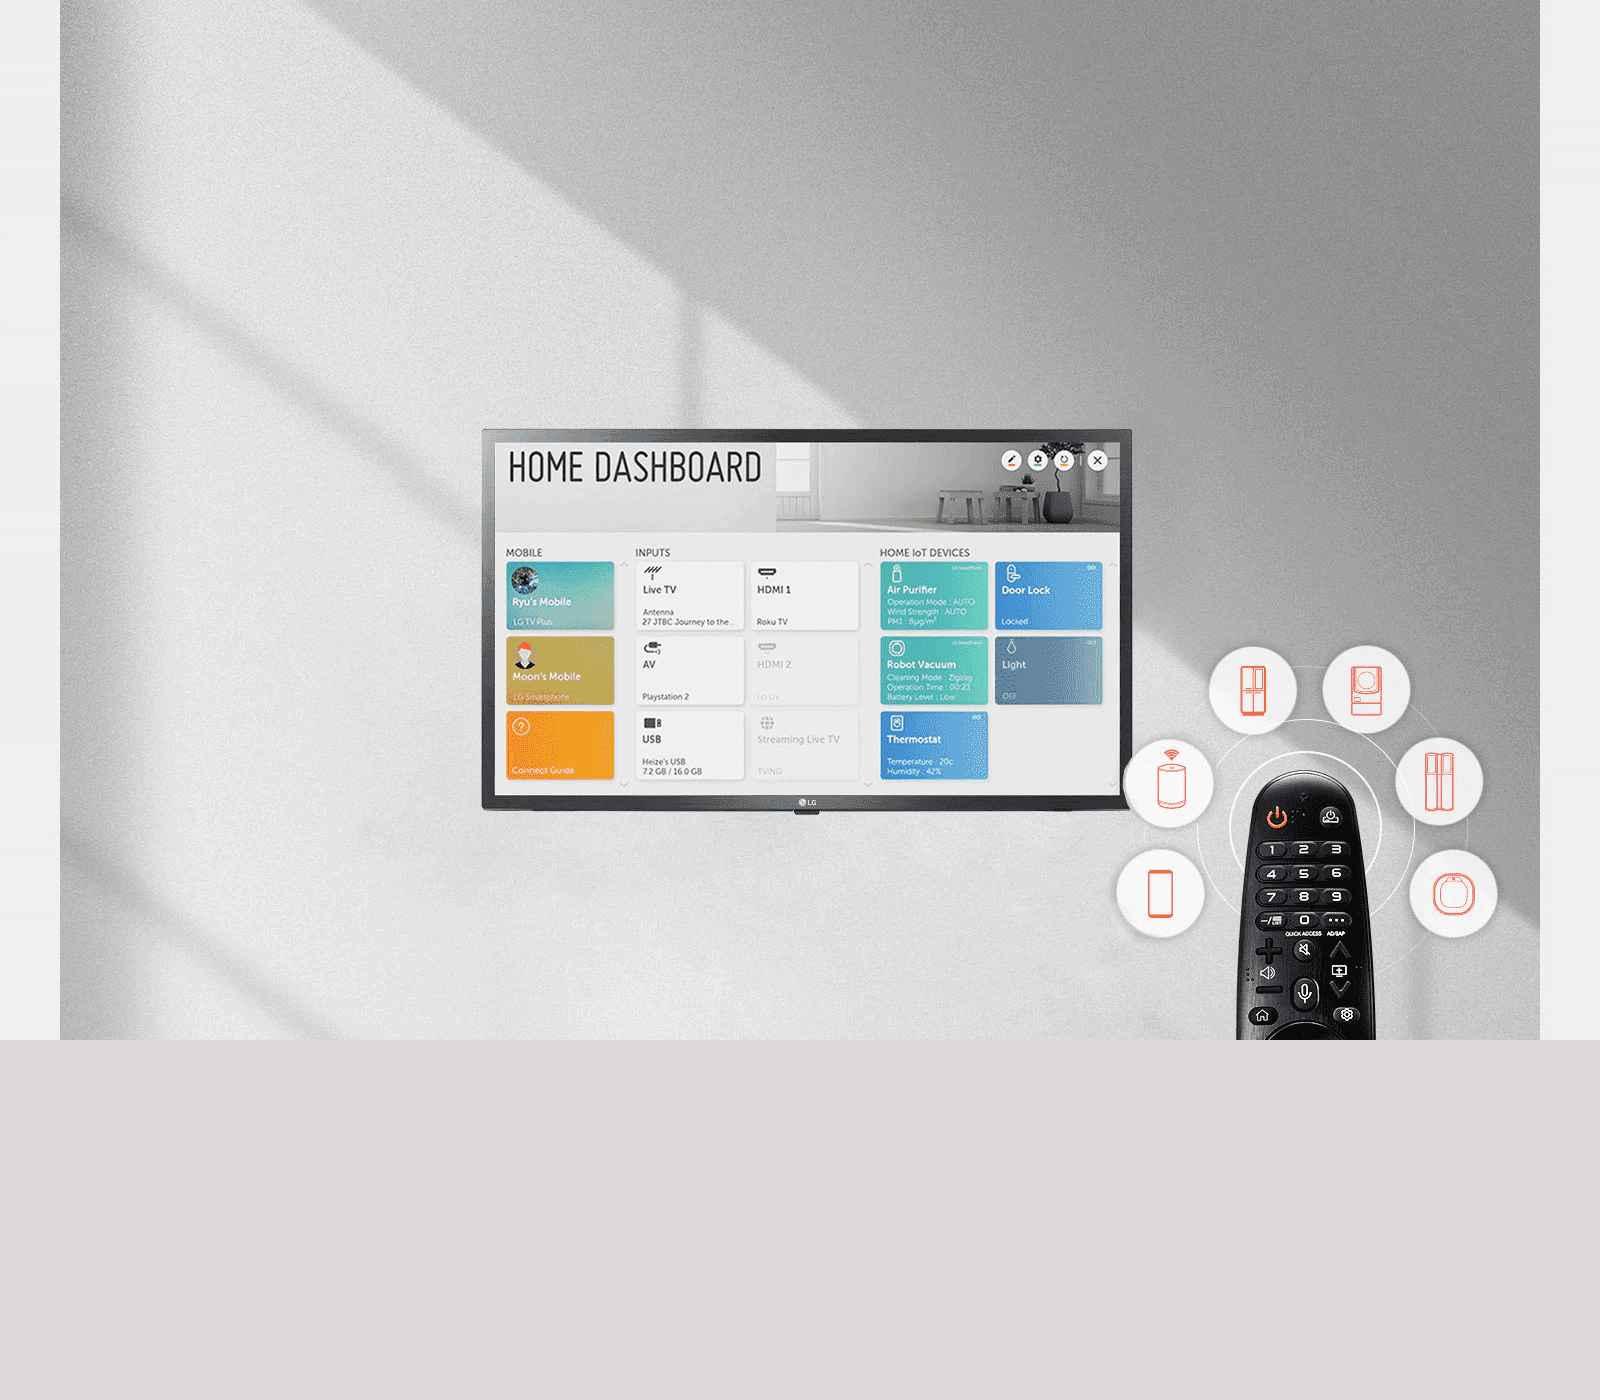 LG Smart LED TV Home Dashboard